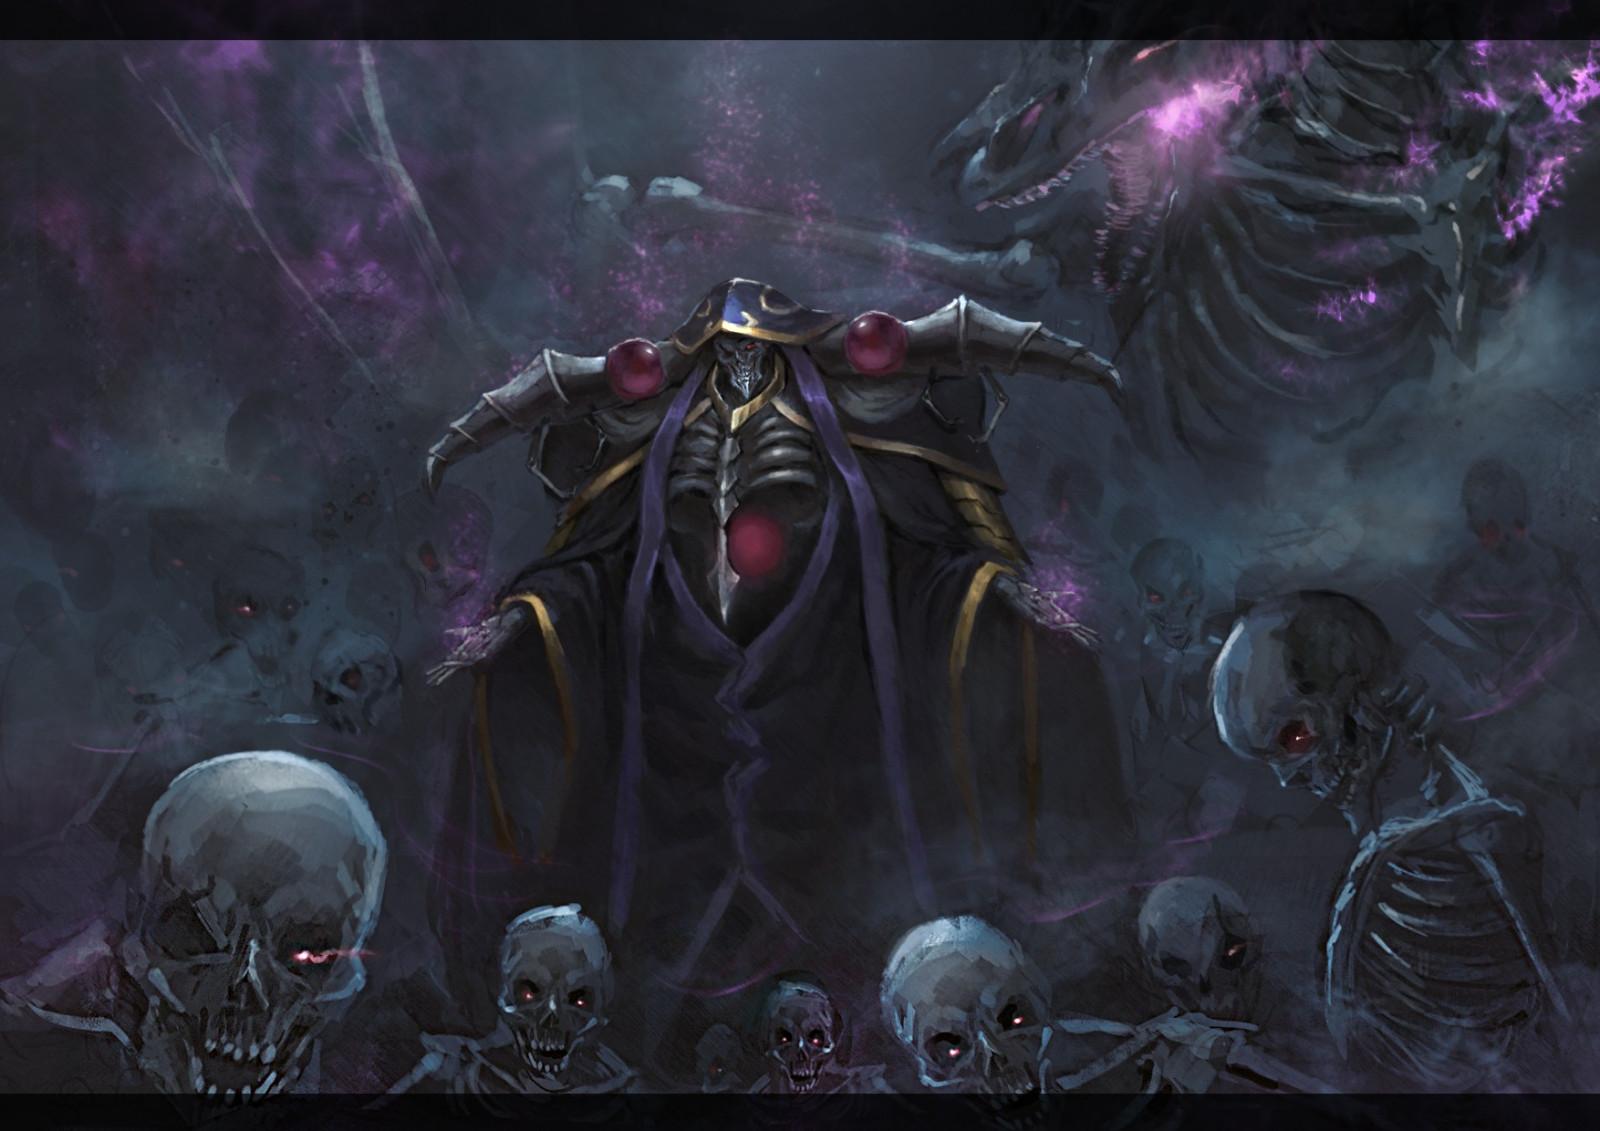 demon skull gif download